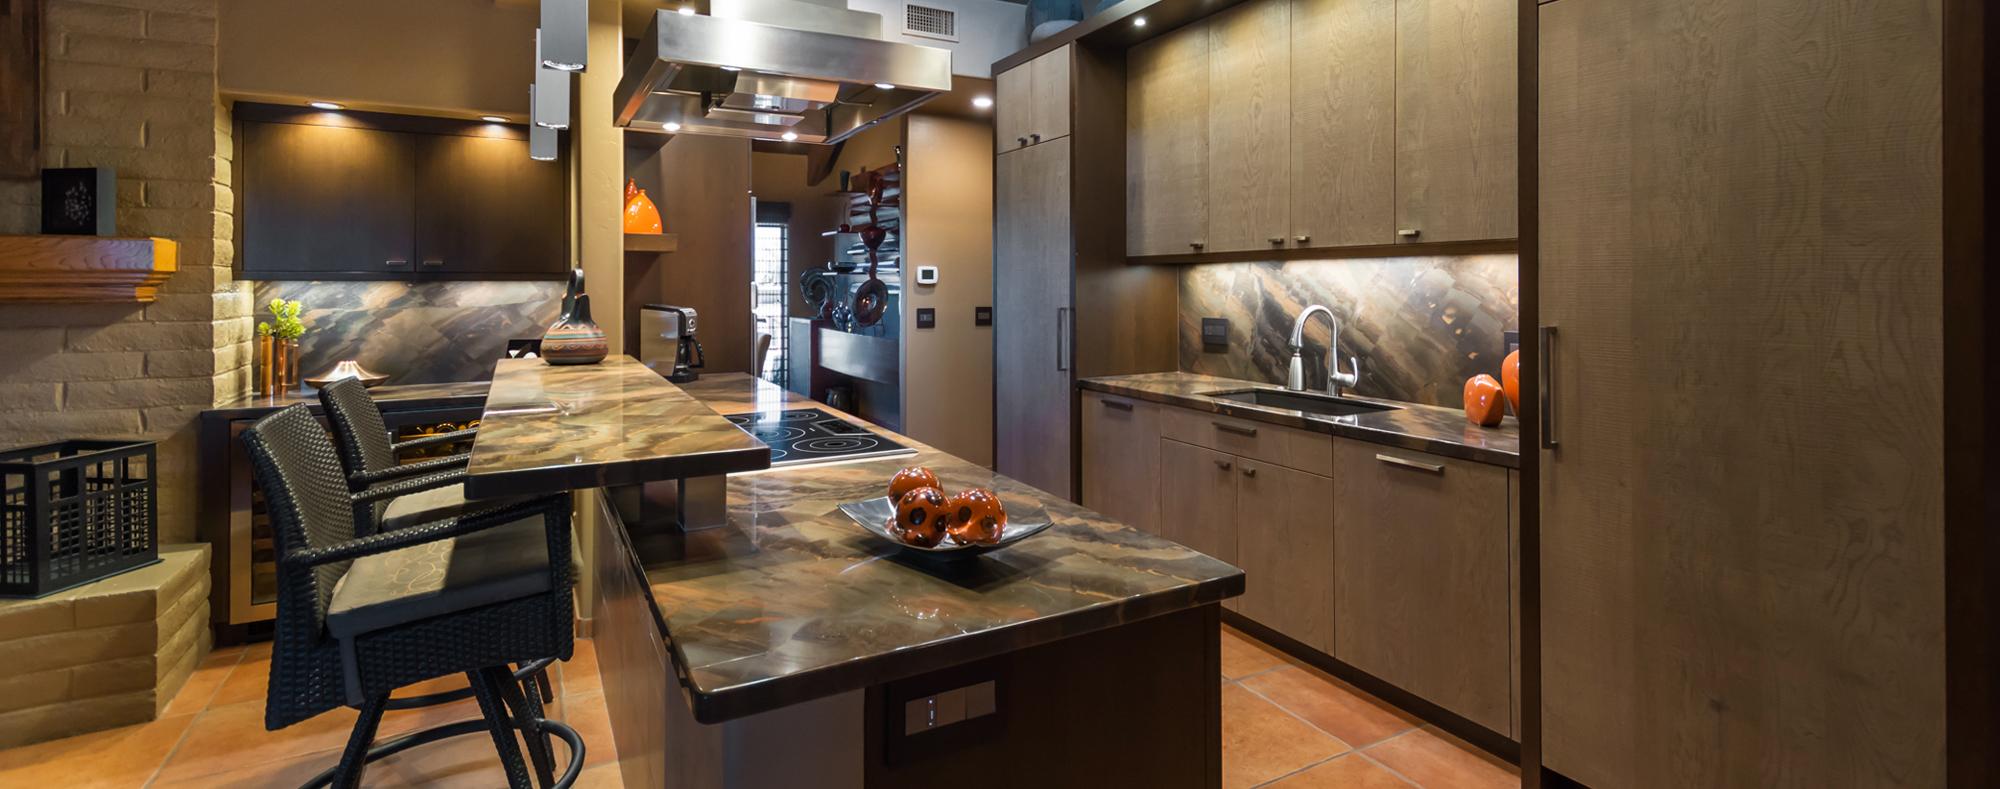 Kitchen And Bath Design Tucson